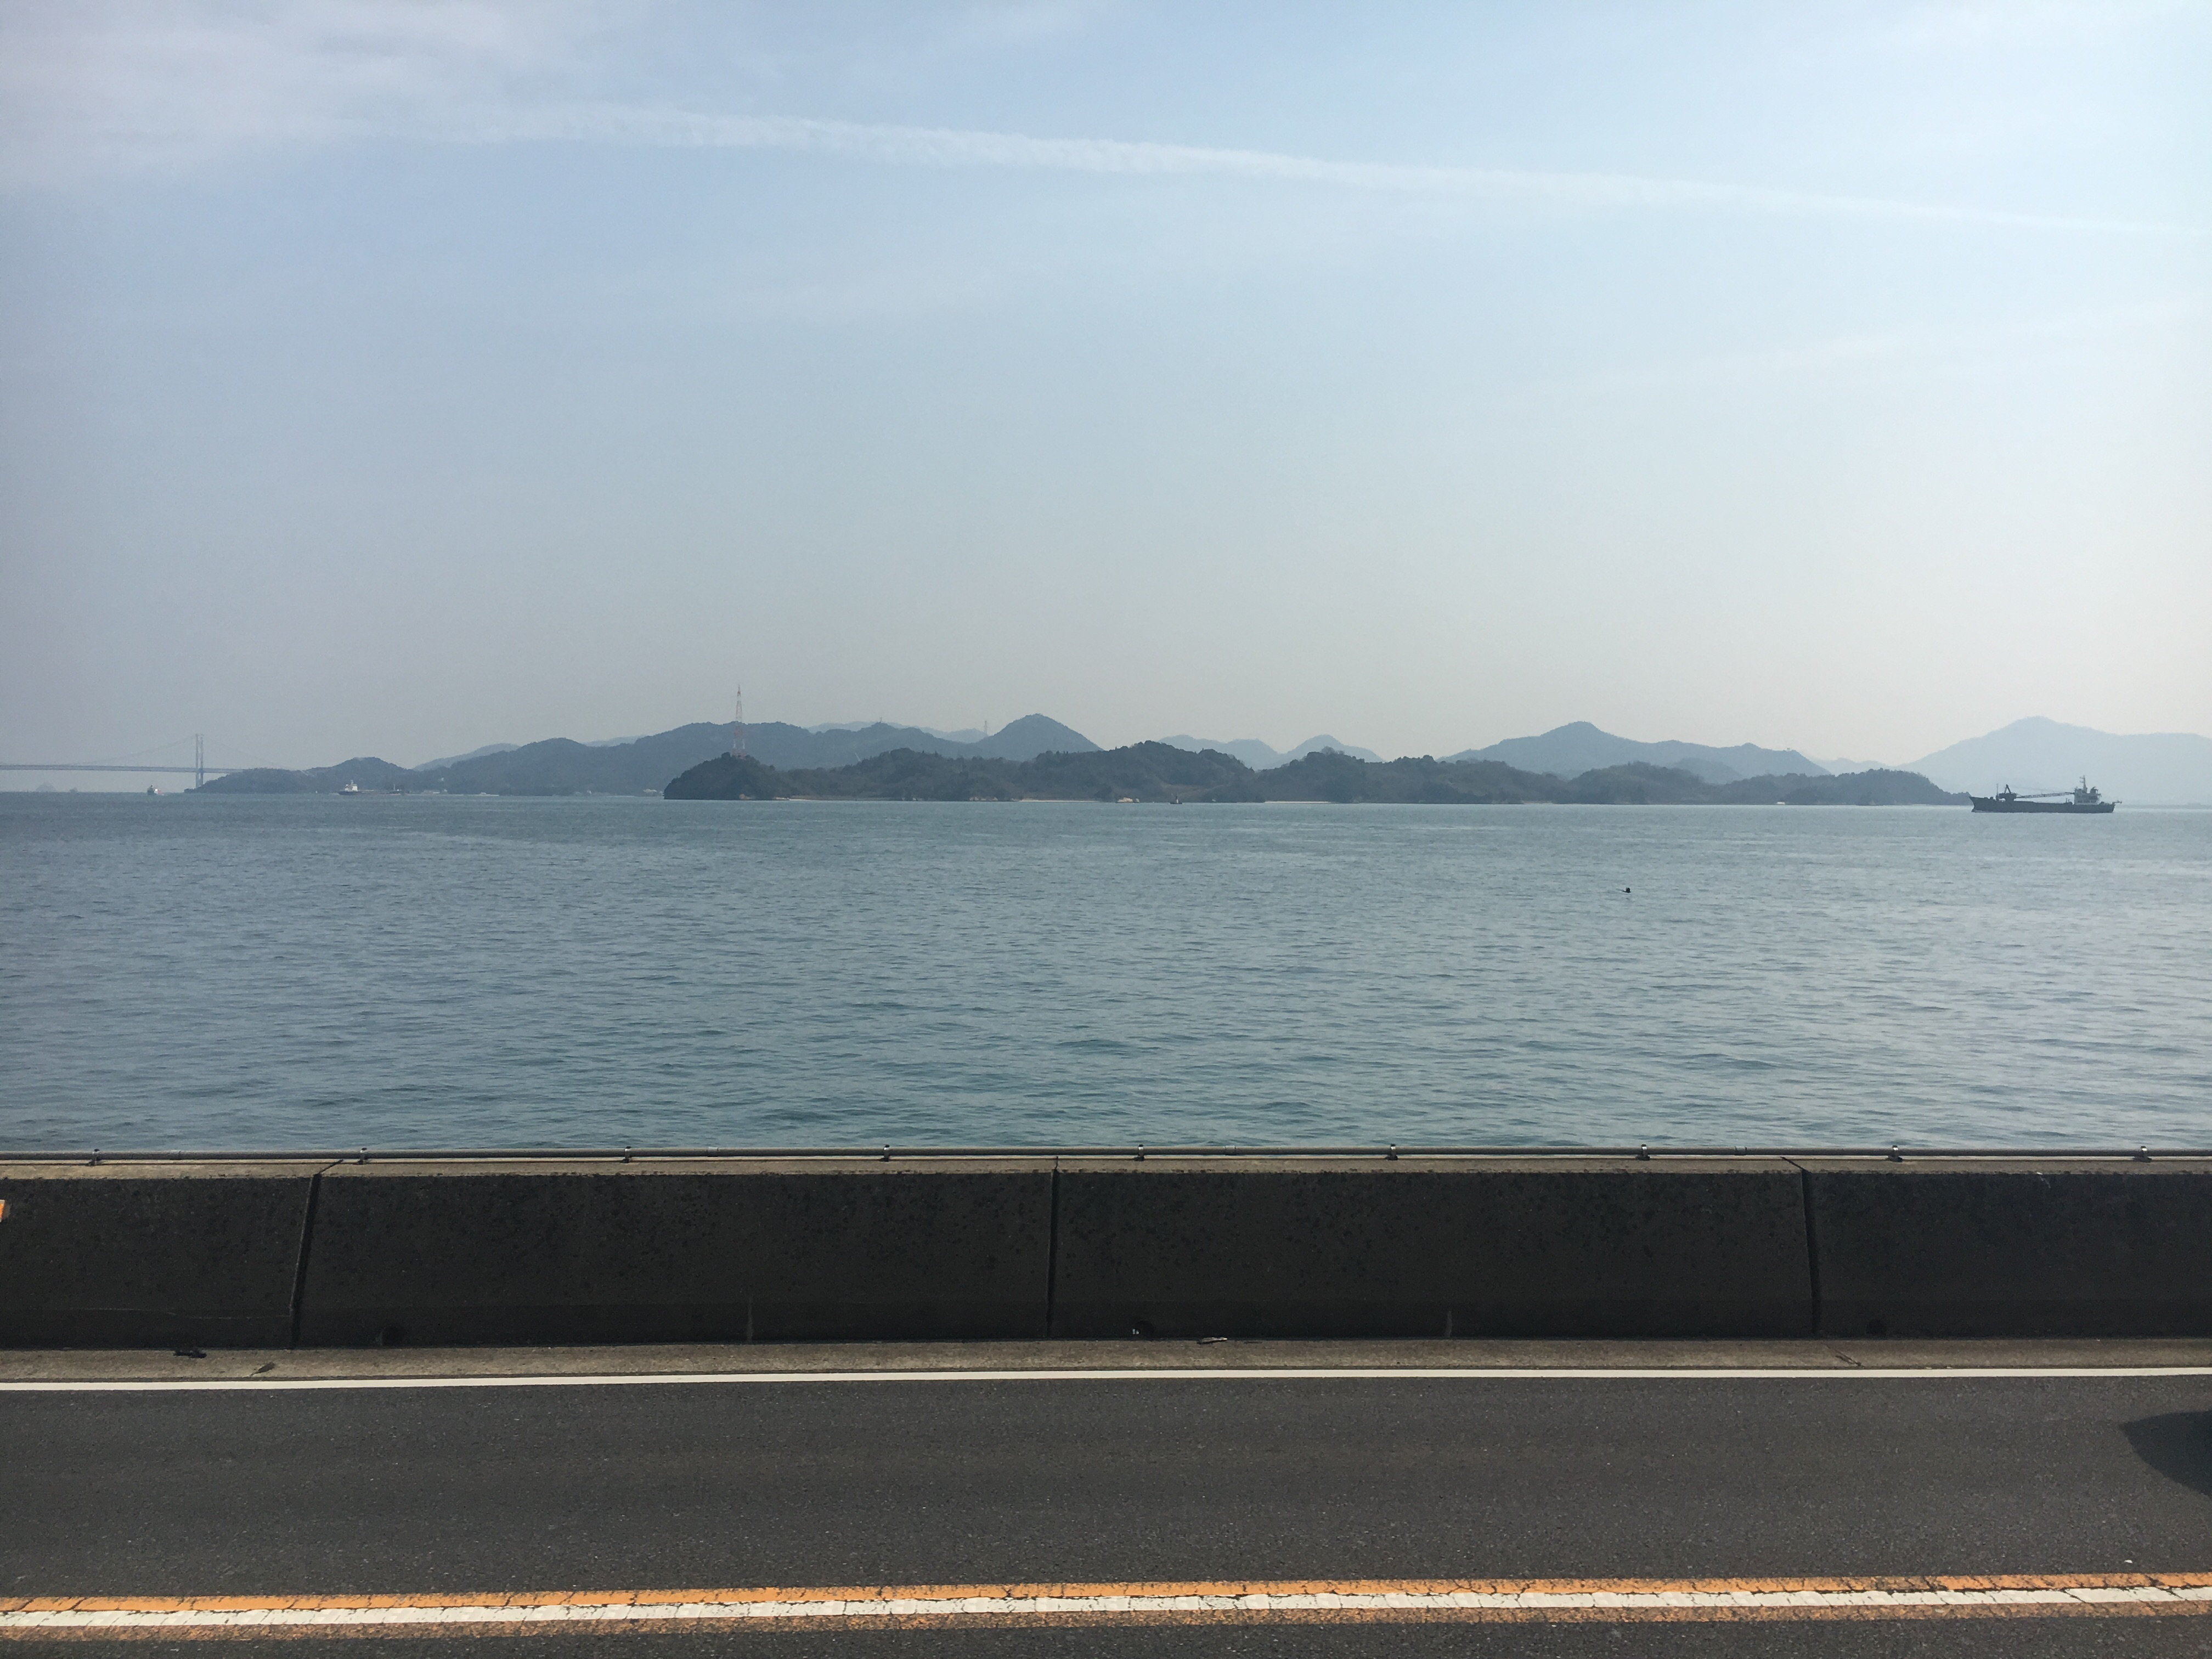 f:id:takumi-bought:20170402205946j:image